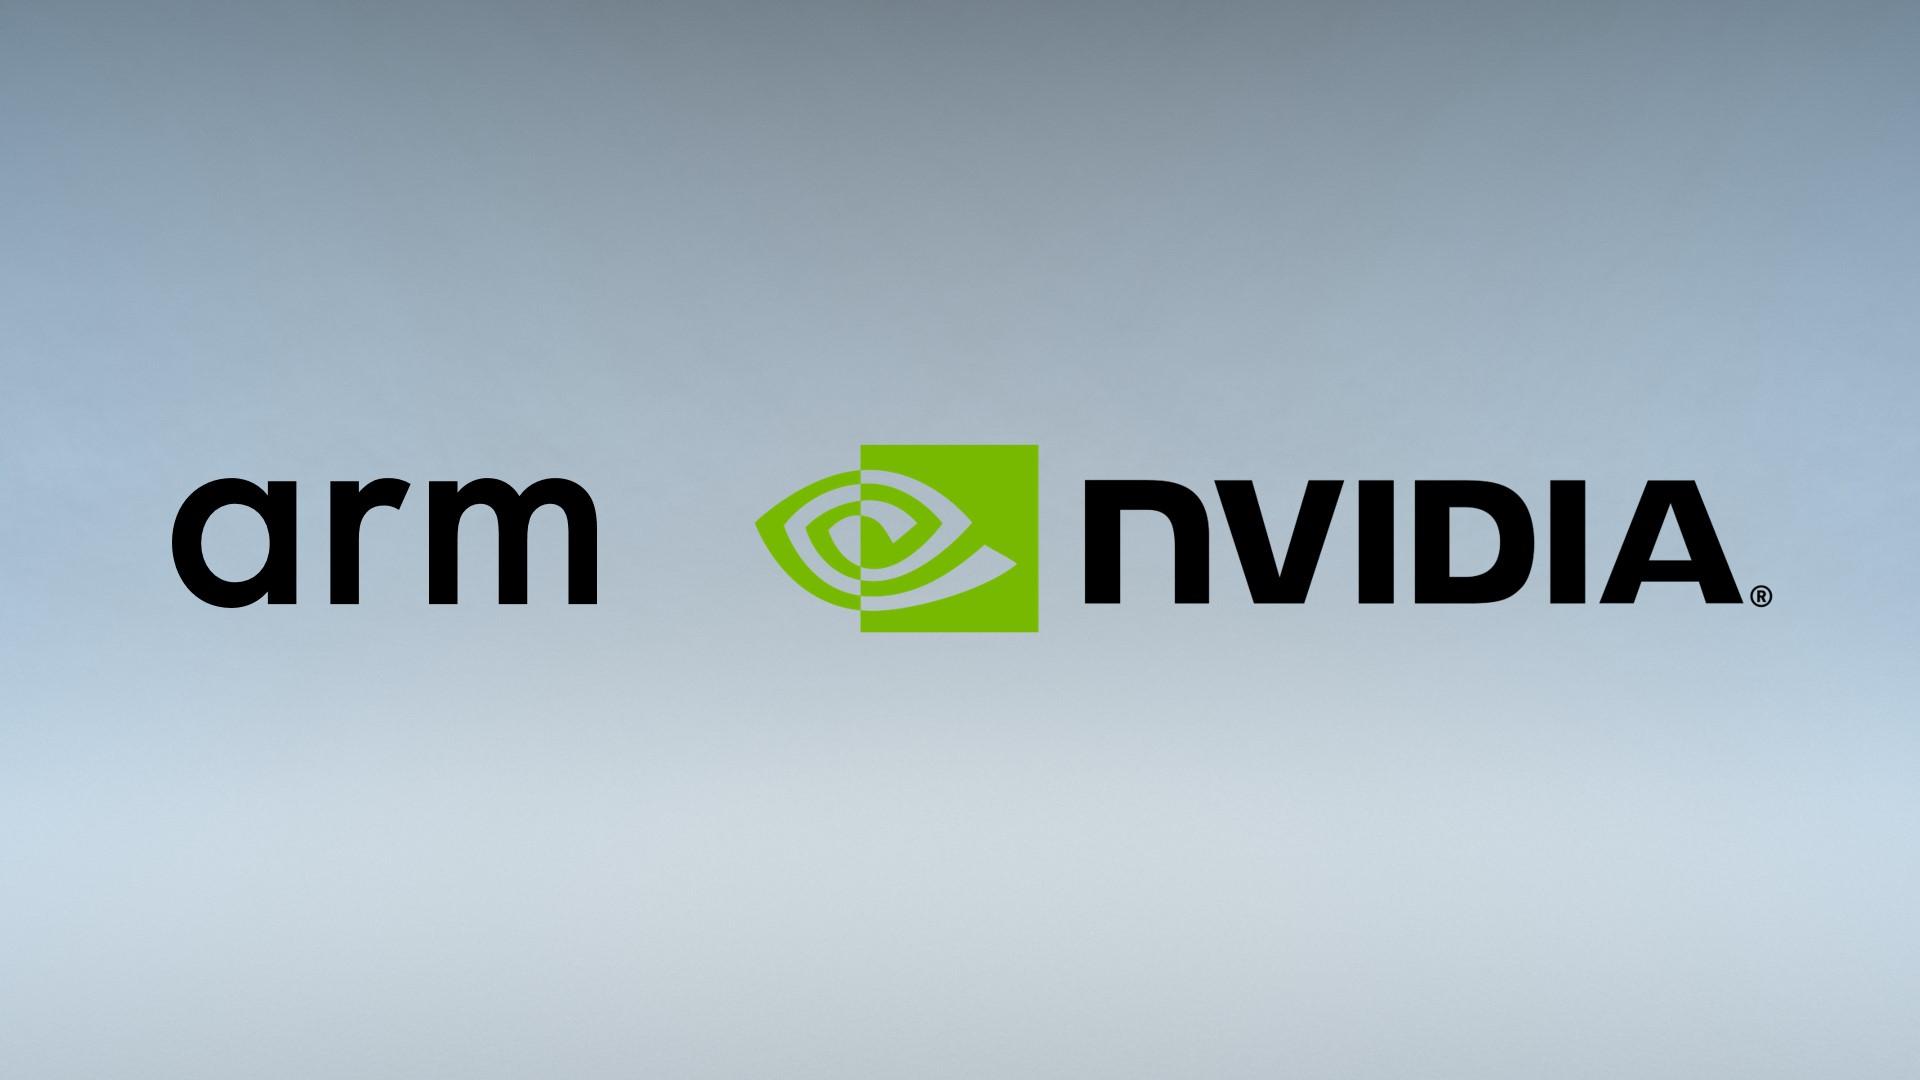 NVIDIA 斥资 400 亿美元收购 Arm